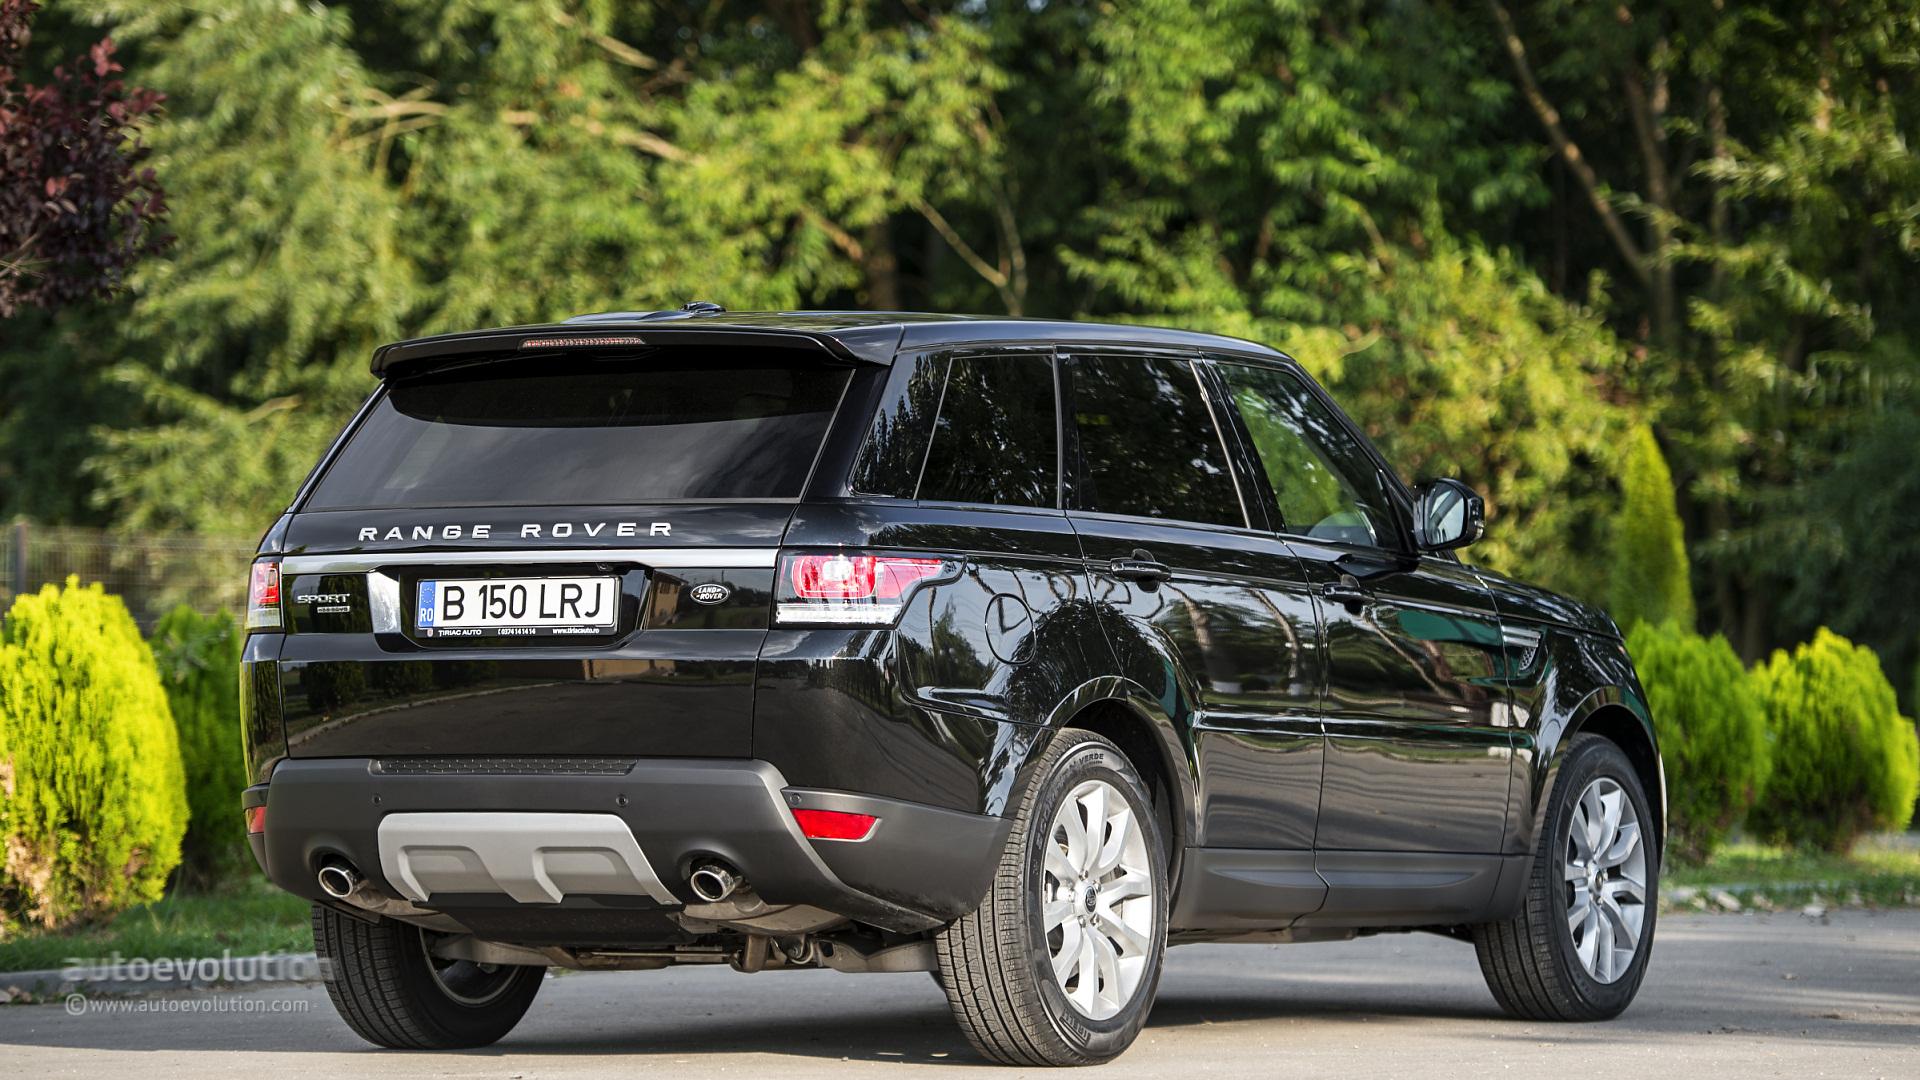 2014 range rover sport review autoevolution. Black Bedroom Furniture Sets. Home Design Ideas